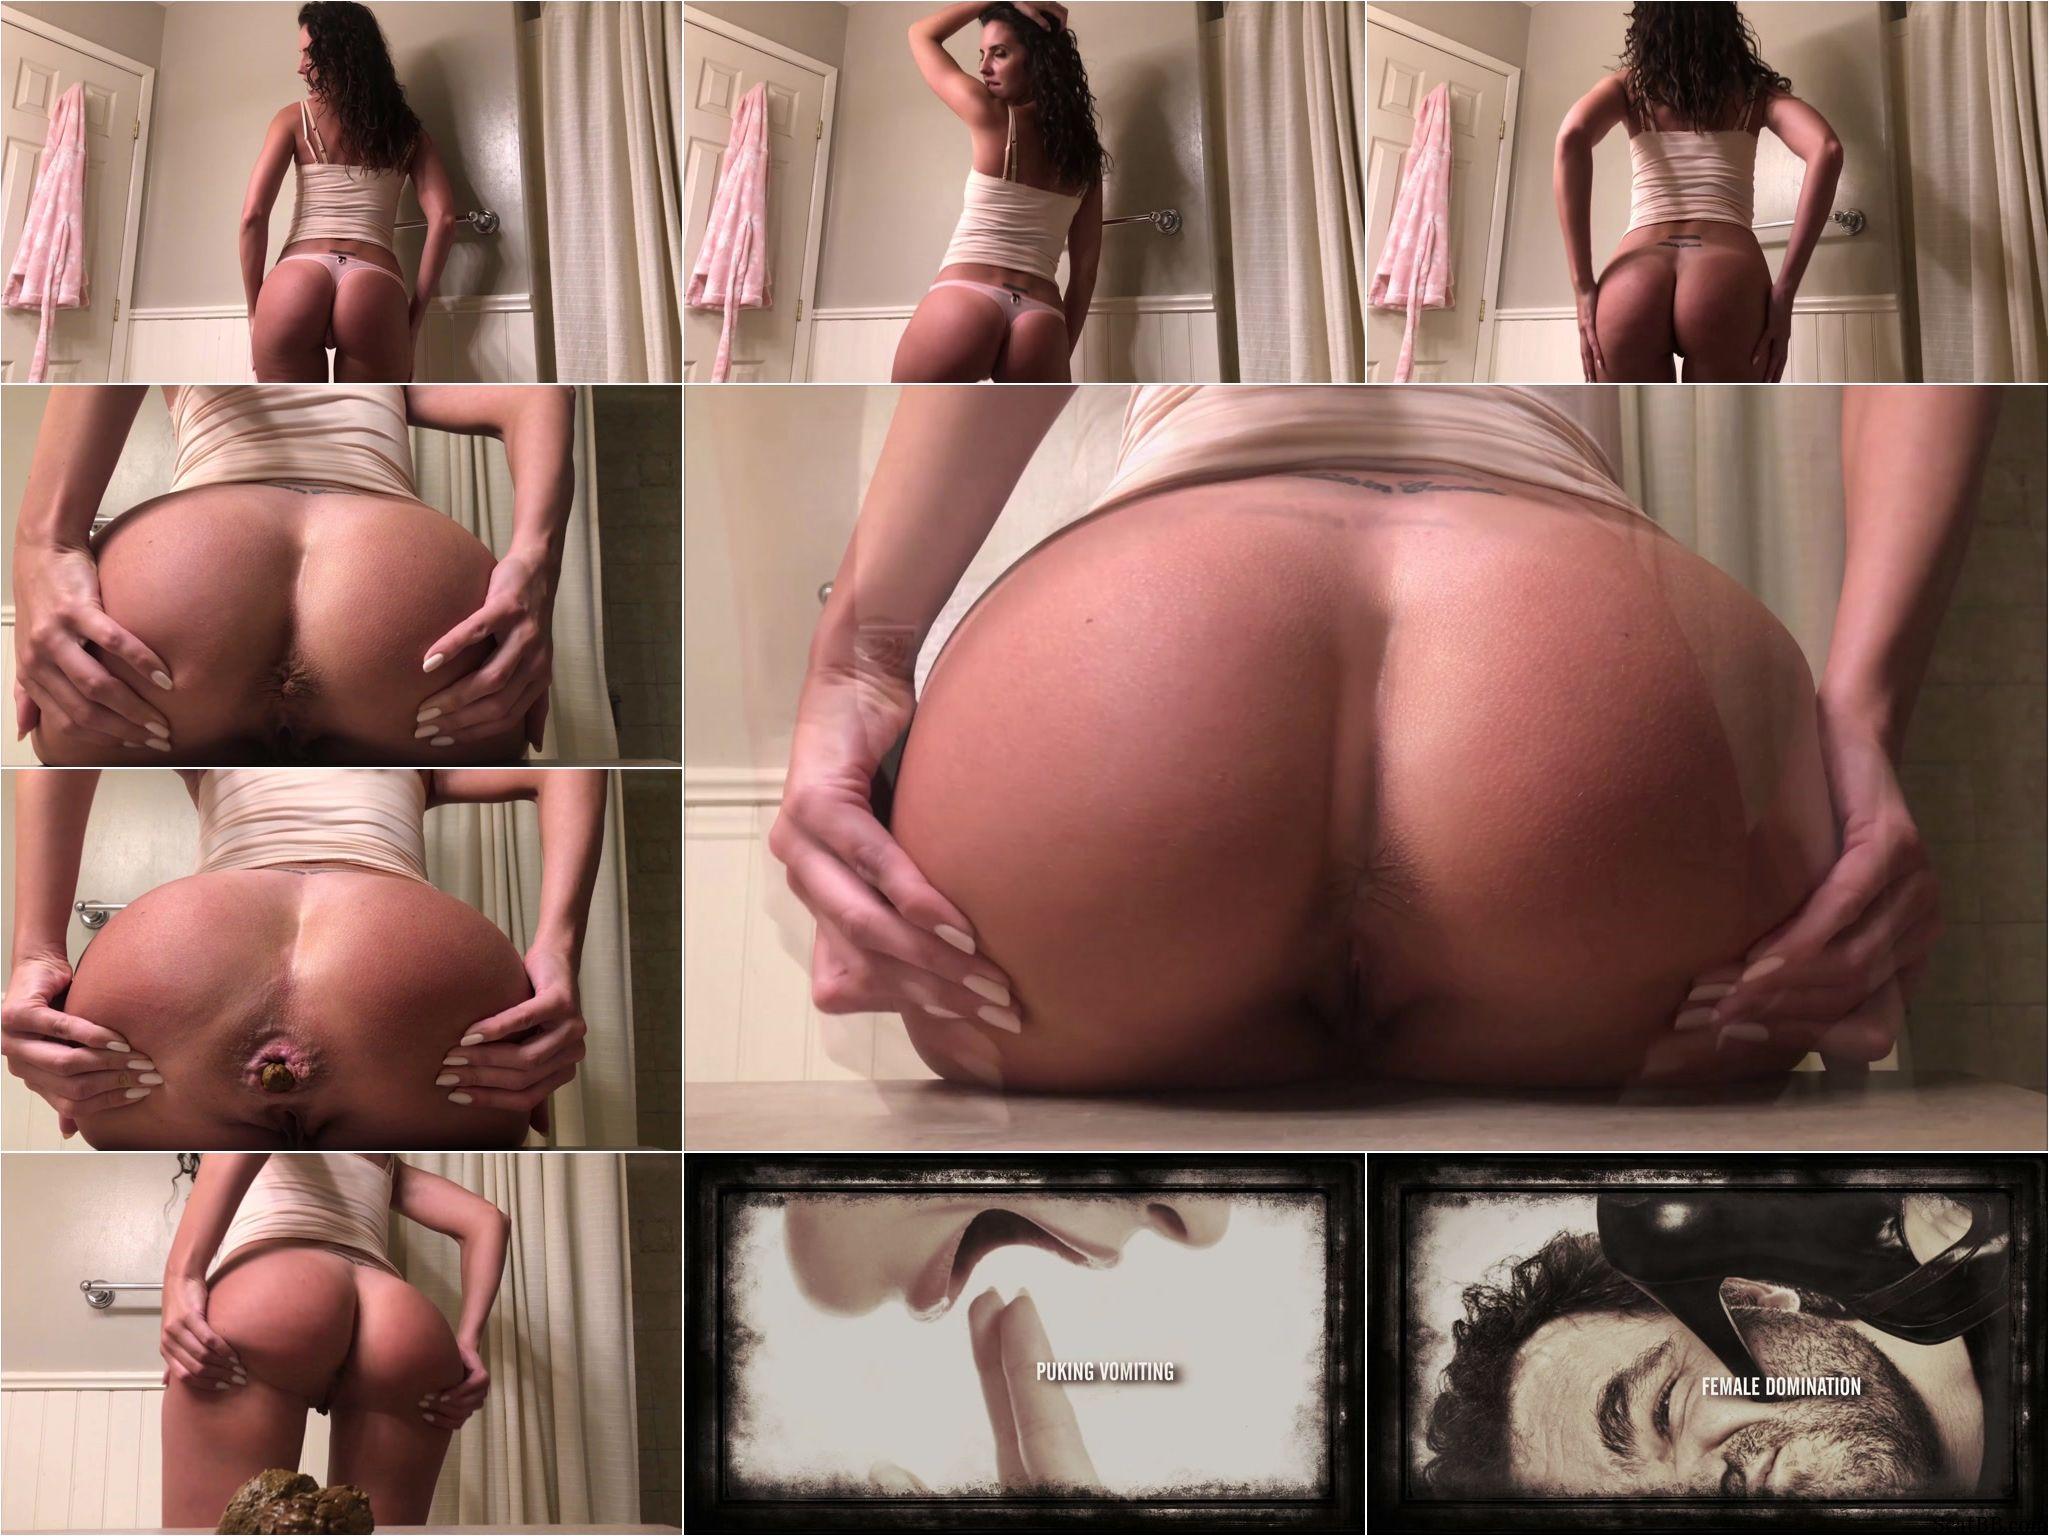 Tina_Amazon_-_Counter_Poop_Close_Up_With_Farts_-_1080p.ScrinList.jpg